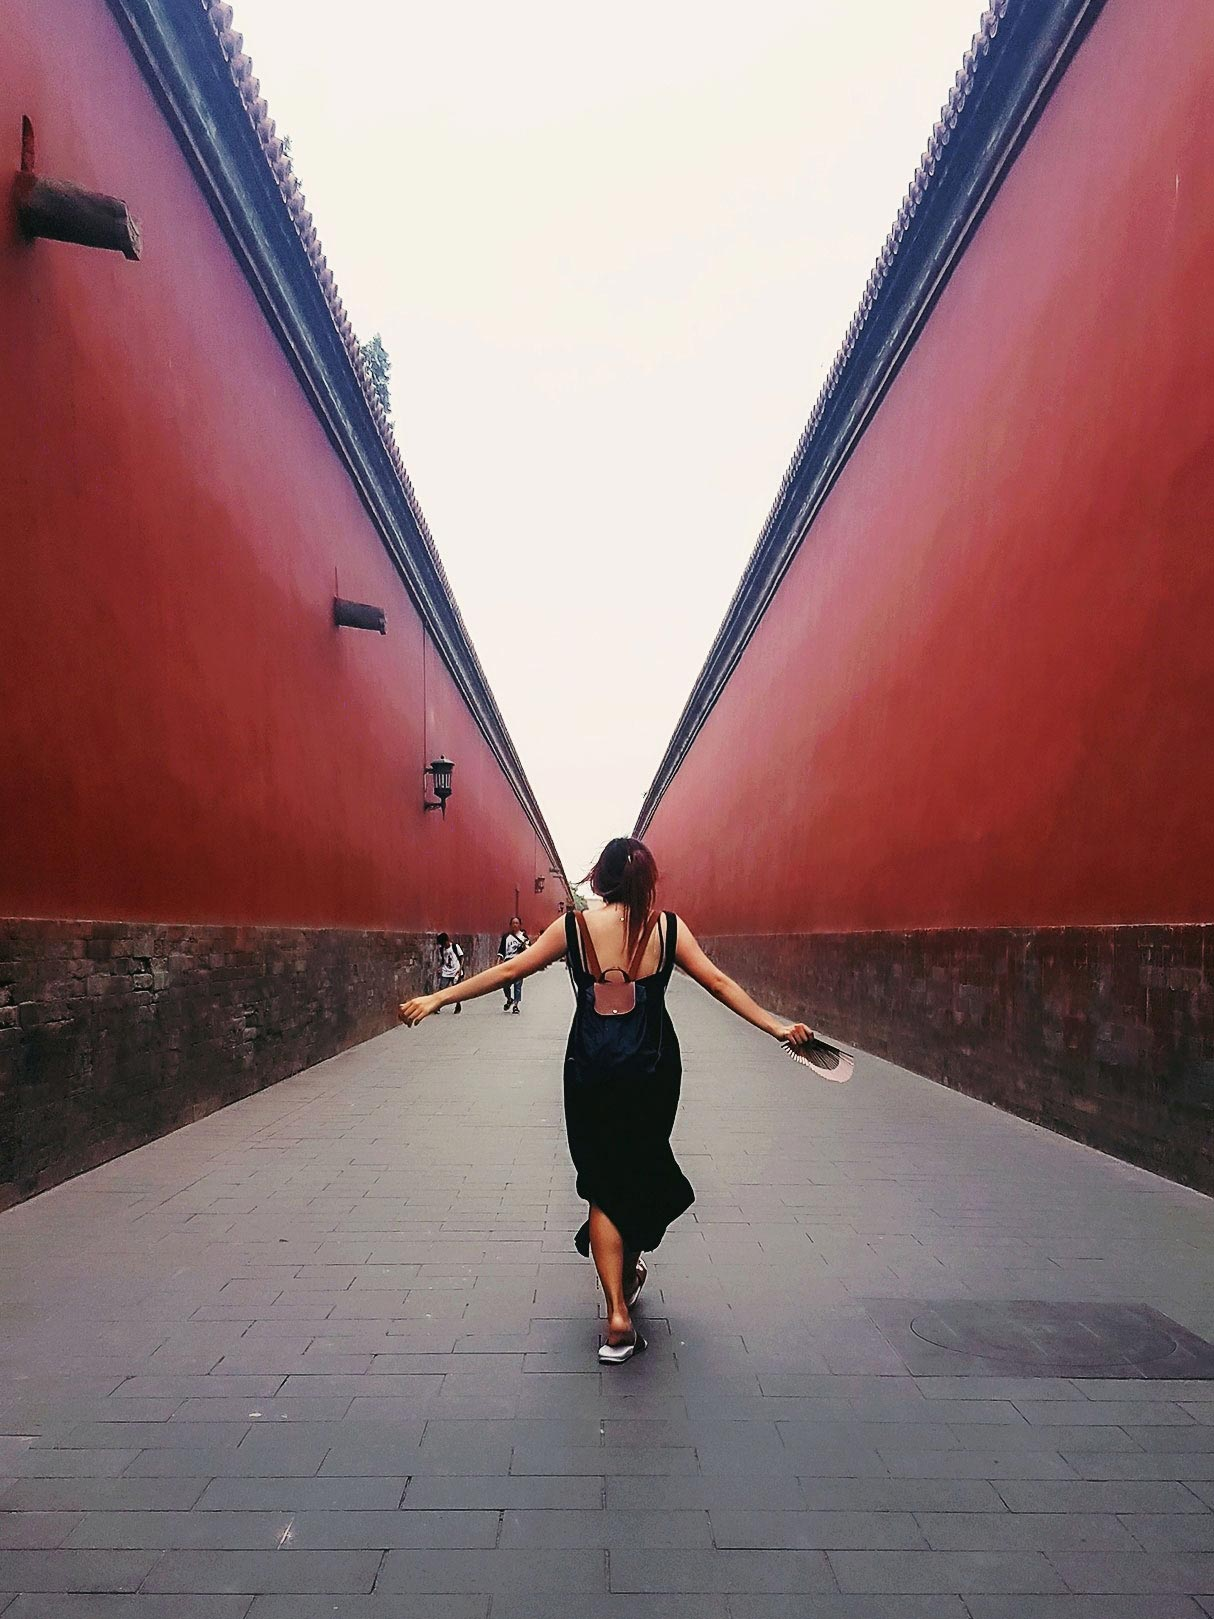 nicol yuk lui Wong yukluistyle nicolyl Beijing forbidden city